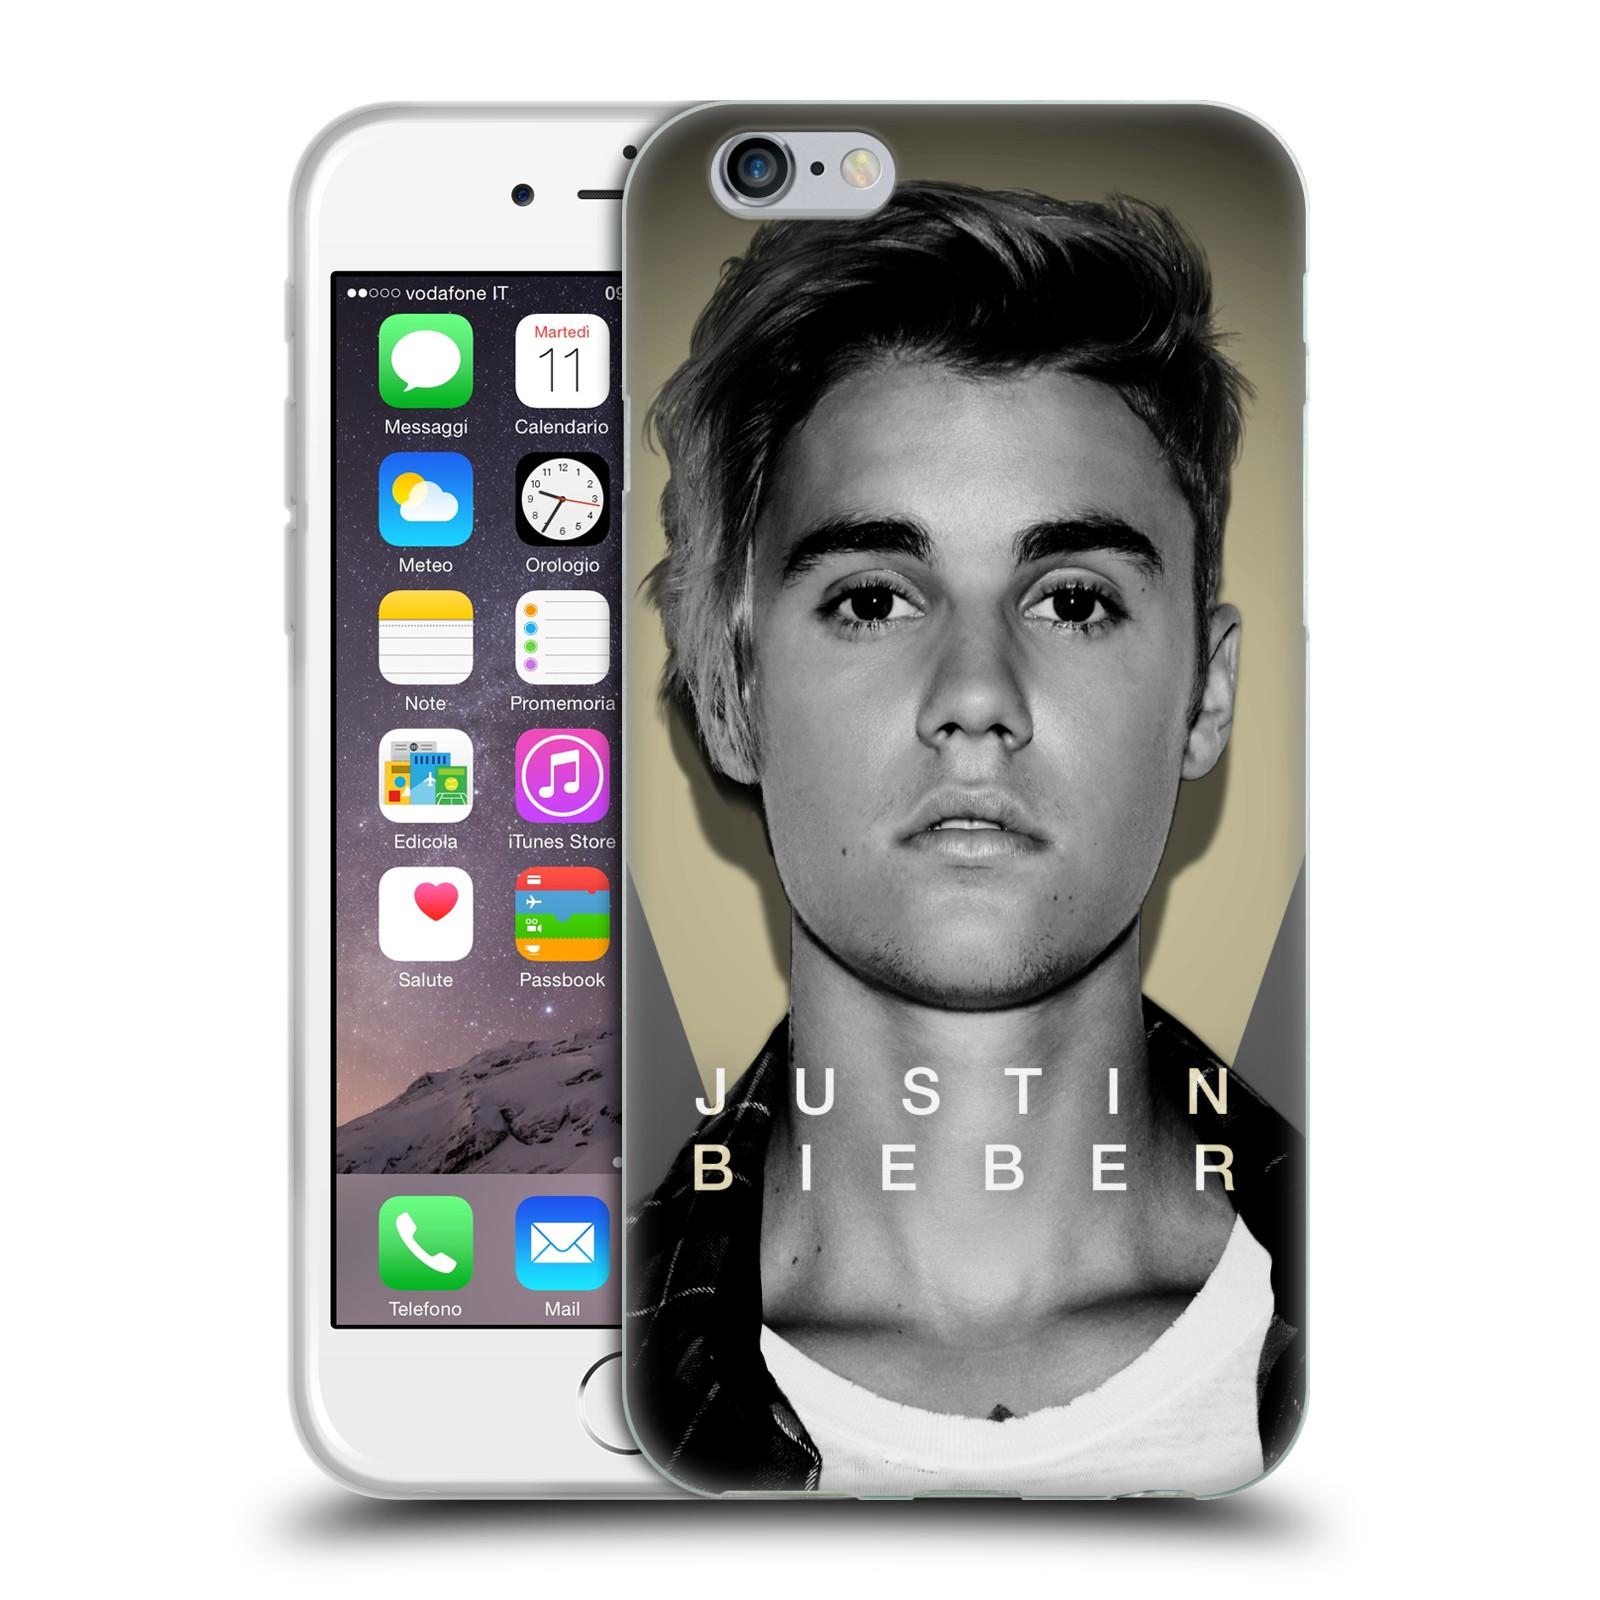 HEAD CASE silikonový obal na mobil Apple Iphone 6 / 6S originální potisk Justin Bieber foto portrét